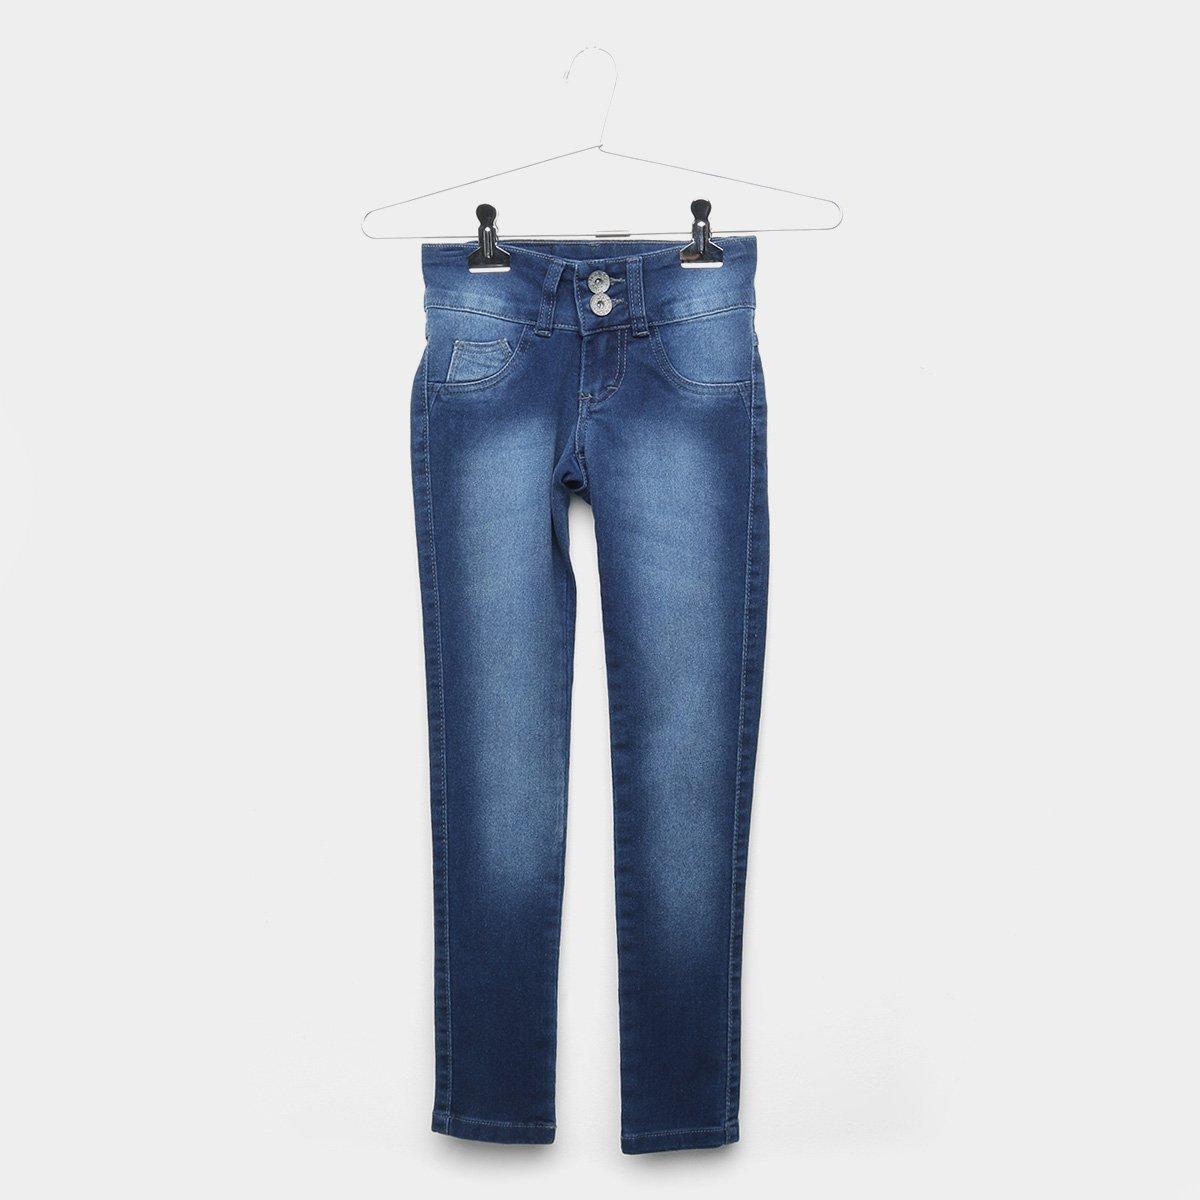 63ae9b8aa Calça Jeans Infantil Grifle Estonada Feminina - Azul Escuro - Compre Agora  | Zattini